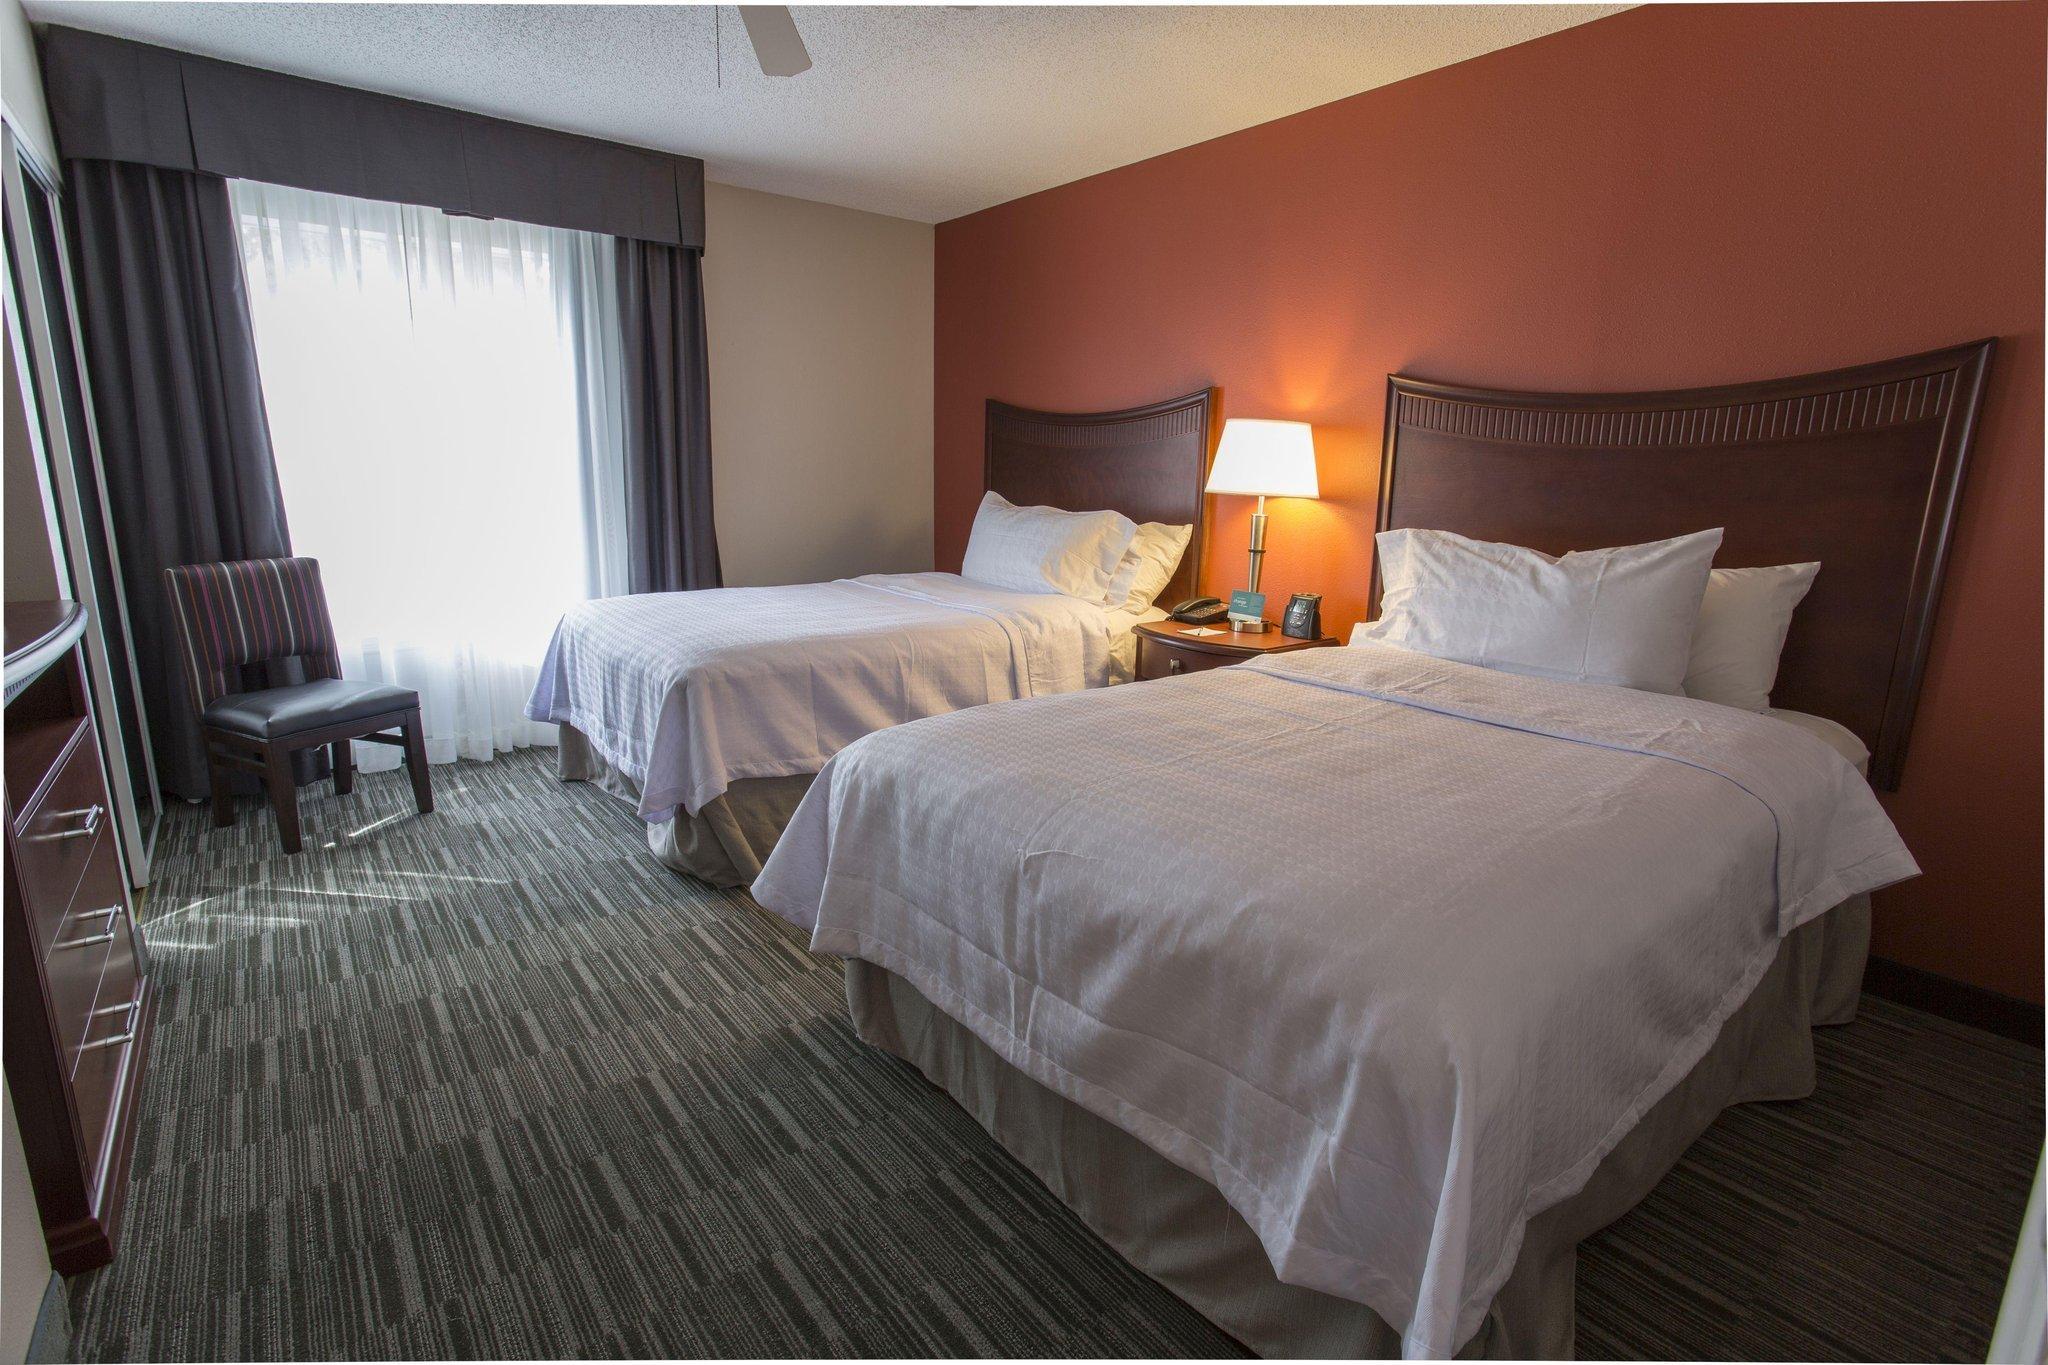 Homewood Suites by Hilton Savannah